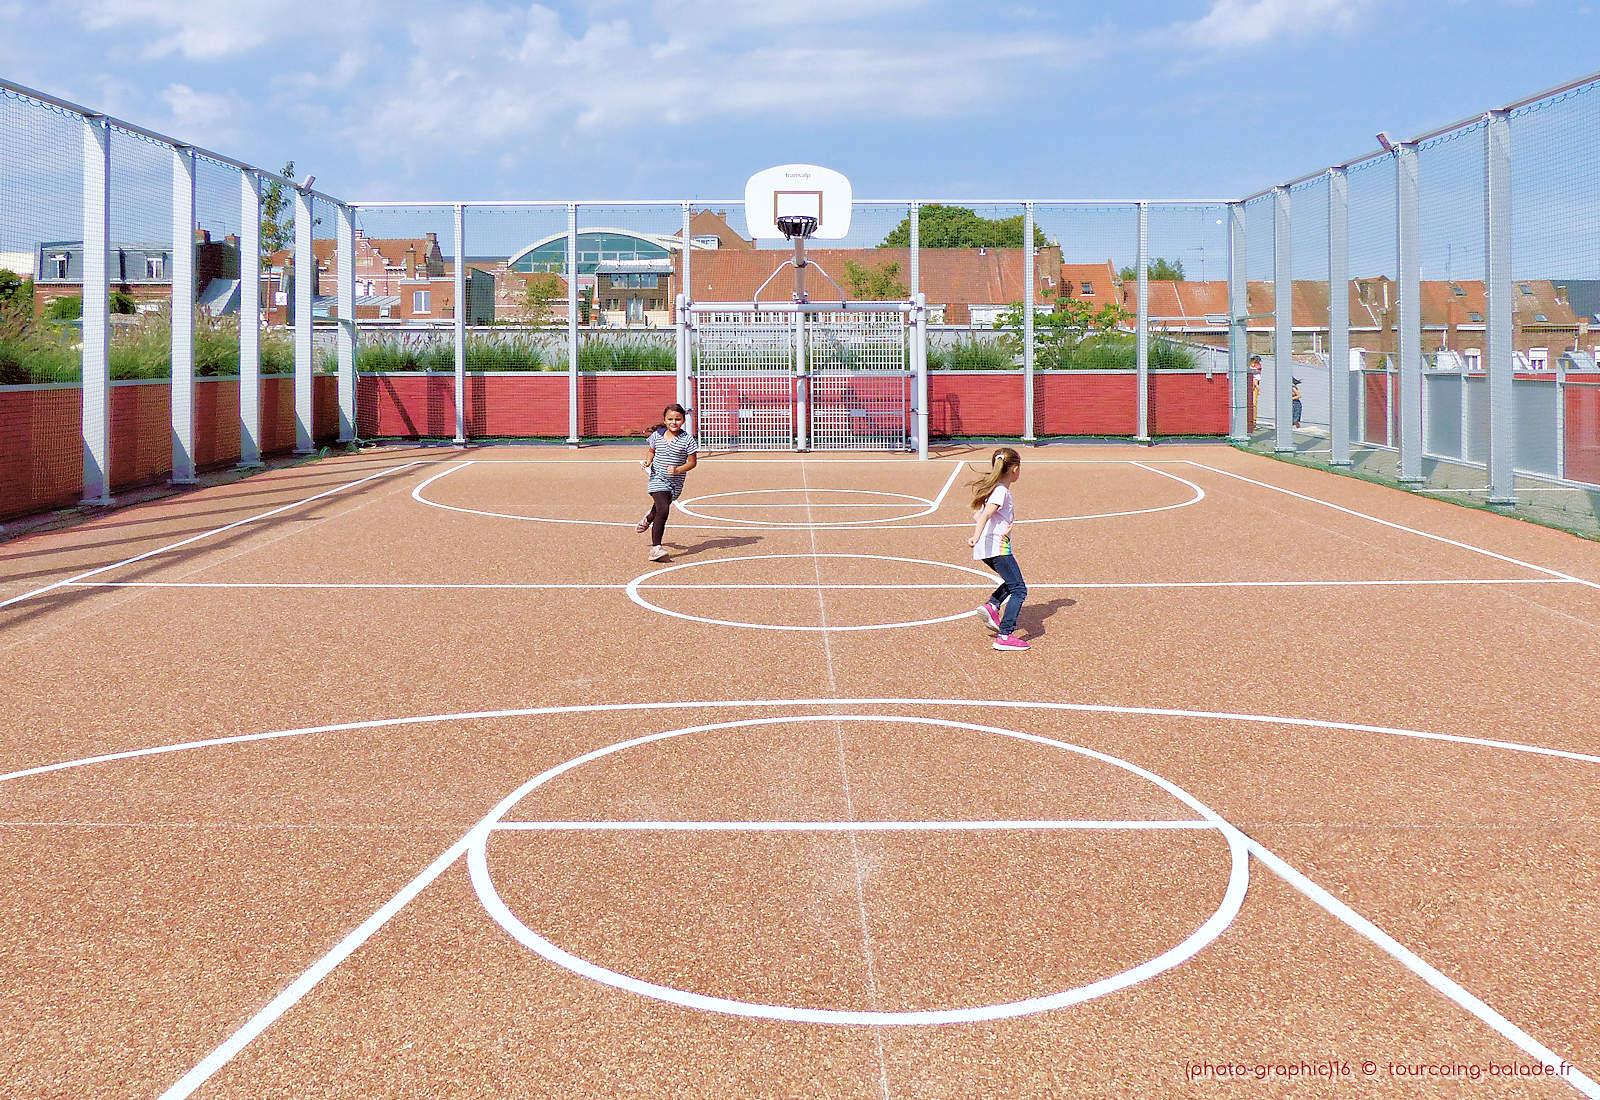 École de Gaulle, Tourcoing - Terrain de Basket